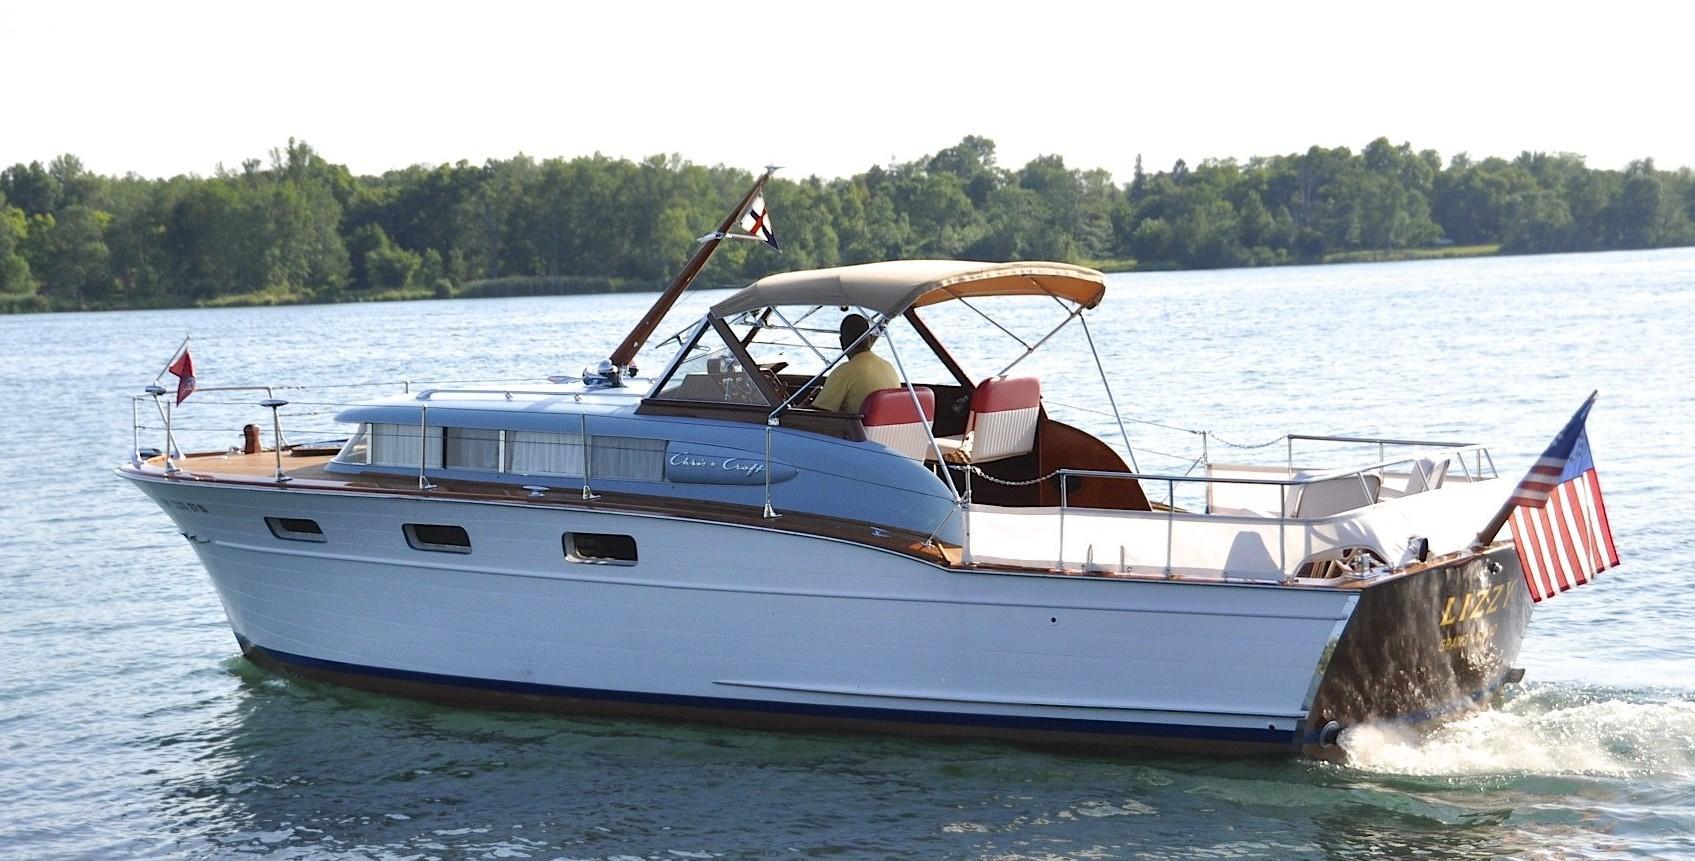 4762692_20140716103157959_3_XLARGE&w=924&h=693&t=1405712076000 1956 chris craft futura power boat for sale www yachtworld com Chris Craft Marine Engines at soozxer.org